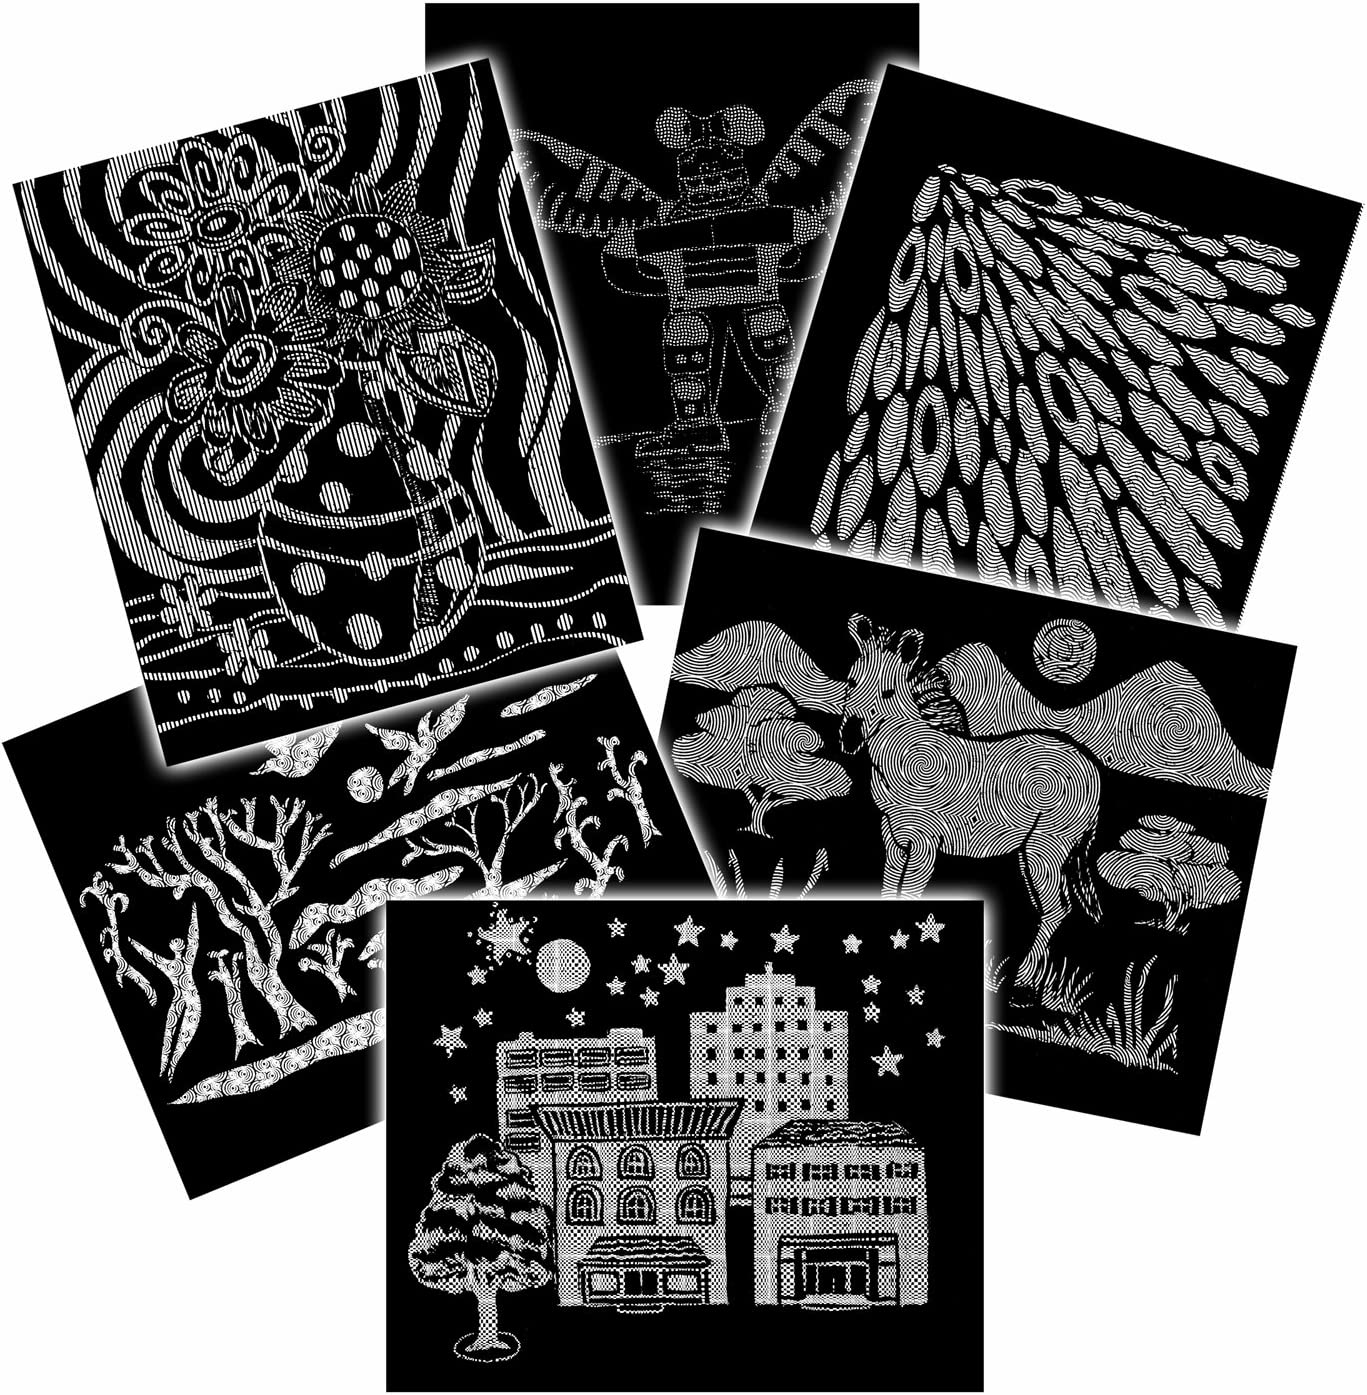 6 Black and White Patterns 60 Sheets Melissa /& Doug Scratch Art Pattern Paper